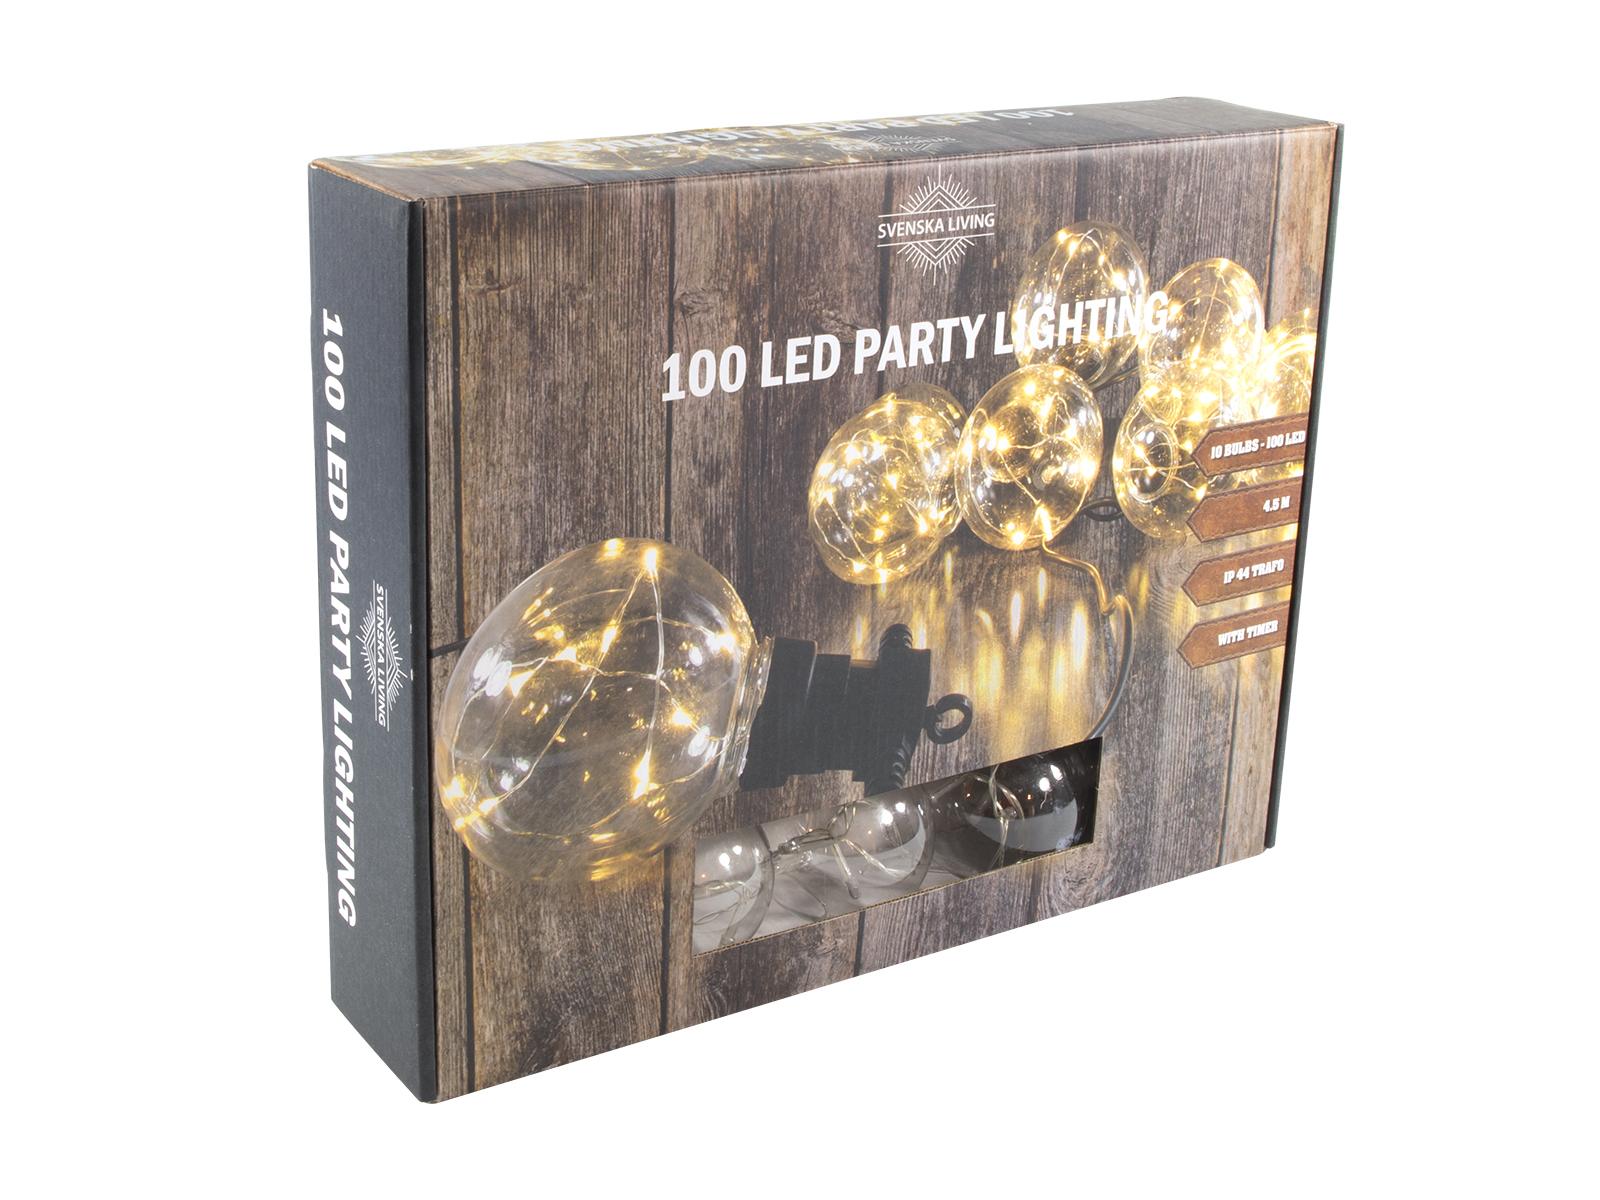 Partykette x10 LED warmweiß Kugel 3m 50cm